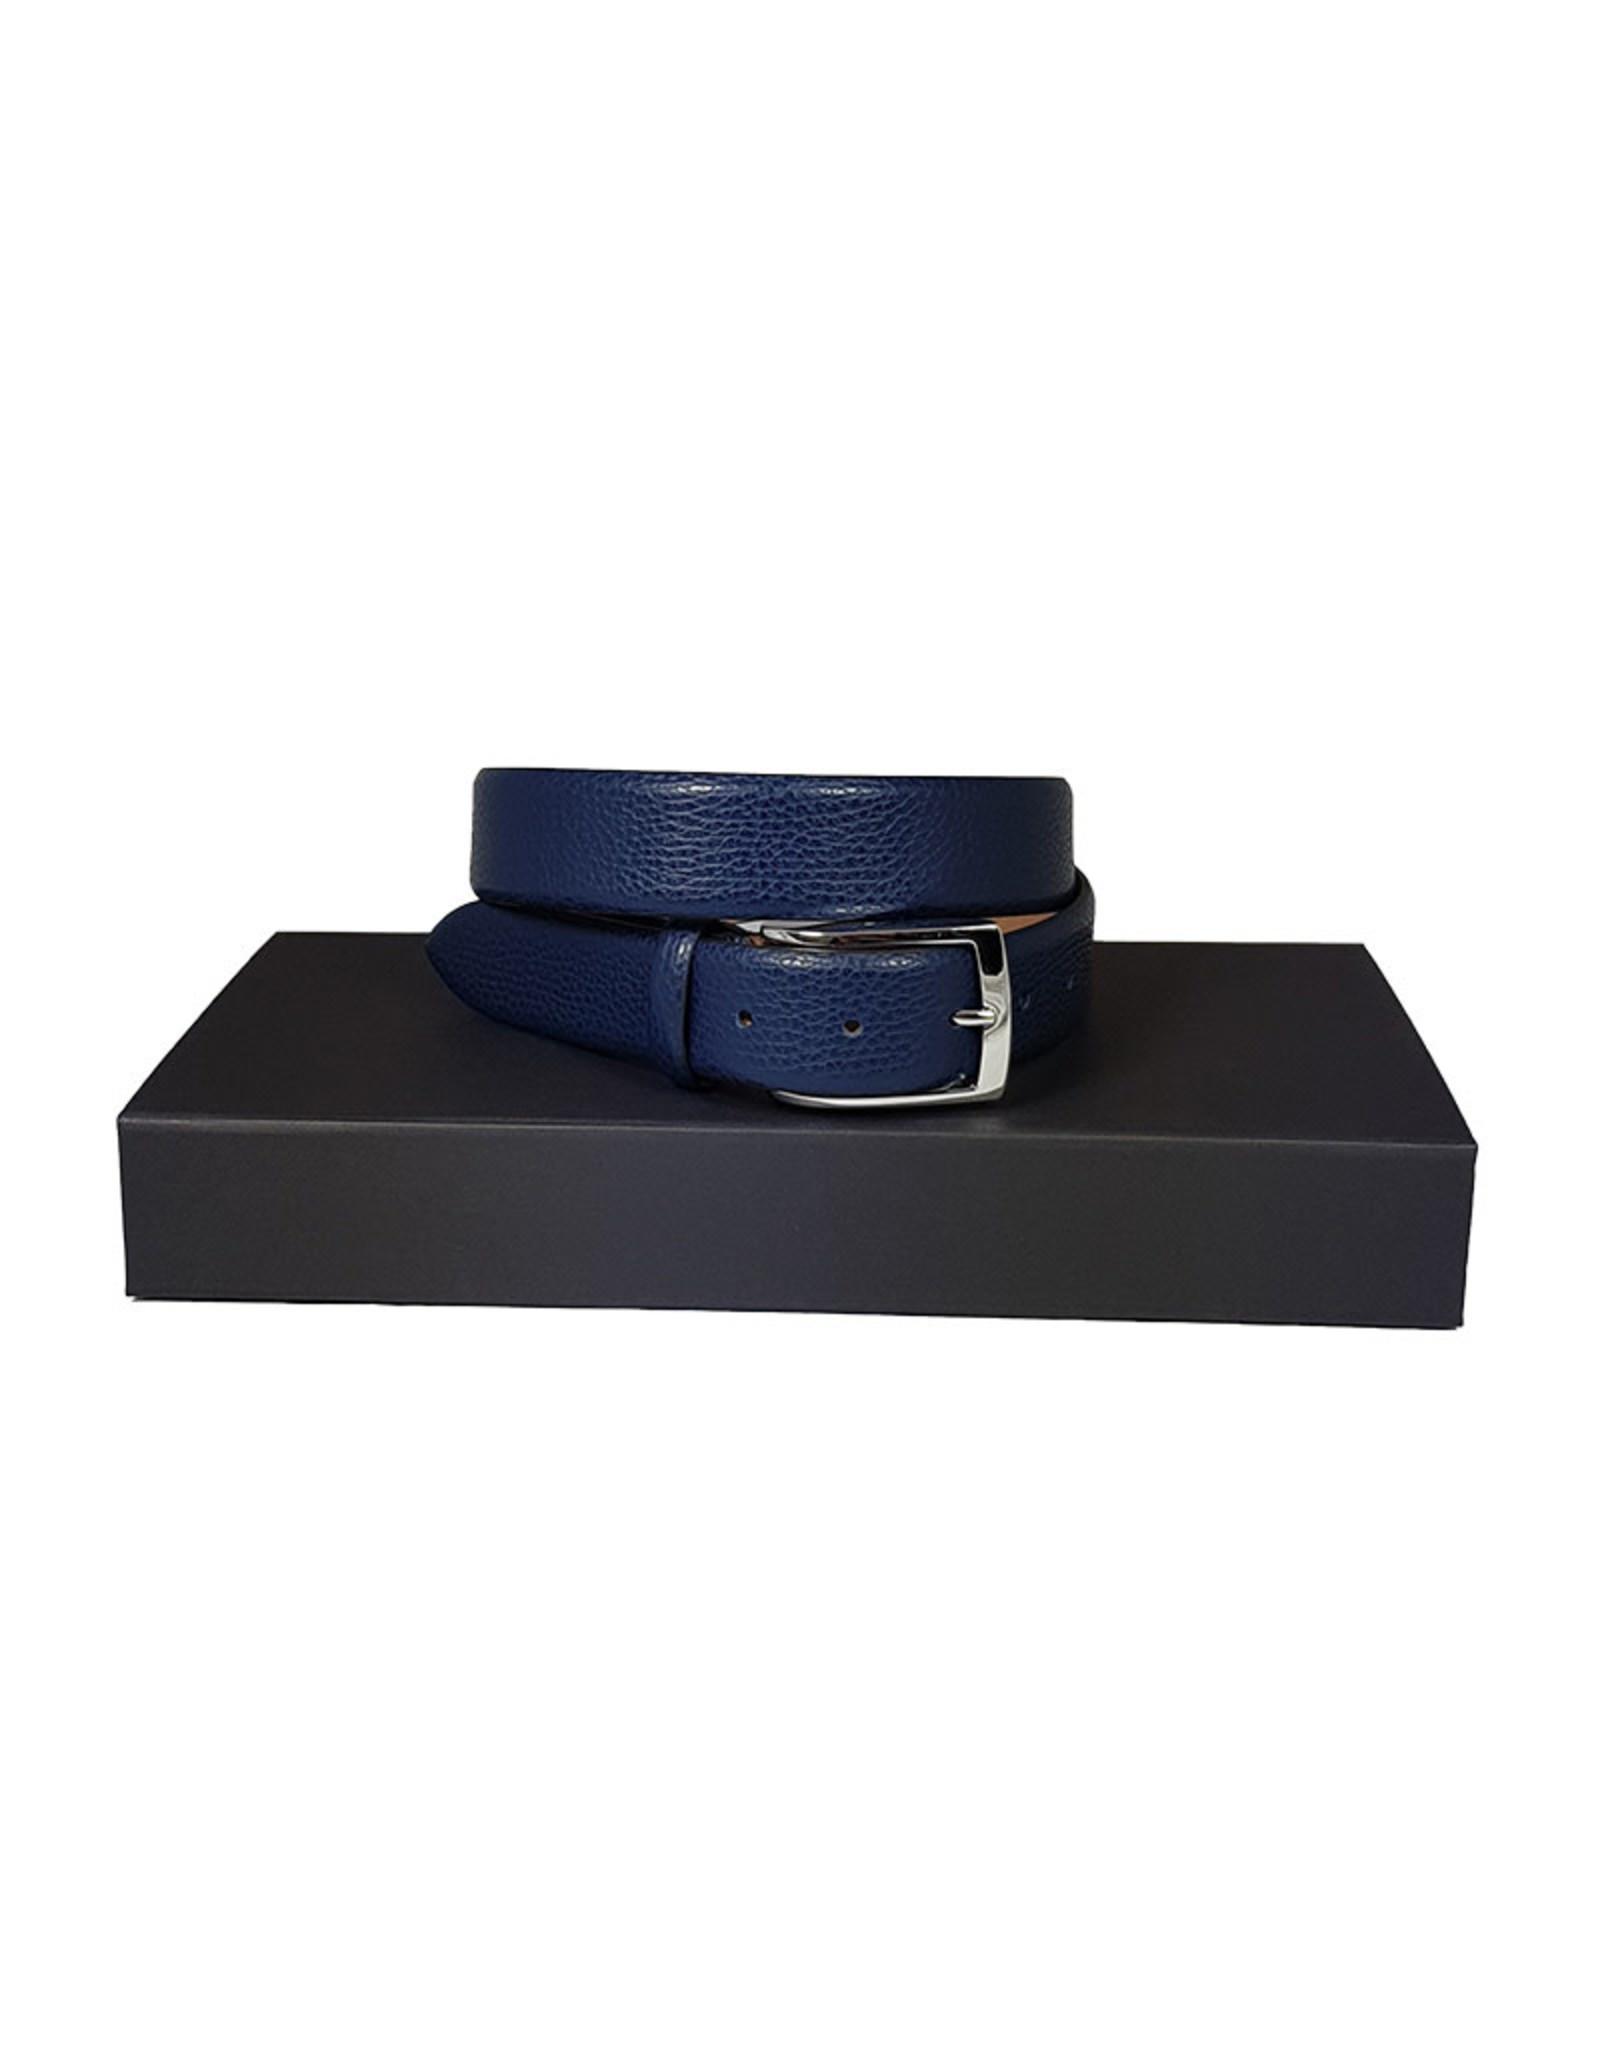 Belts+ Belts+ riem leder blauw Bull 20096/660